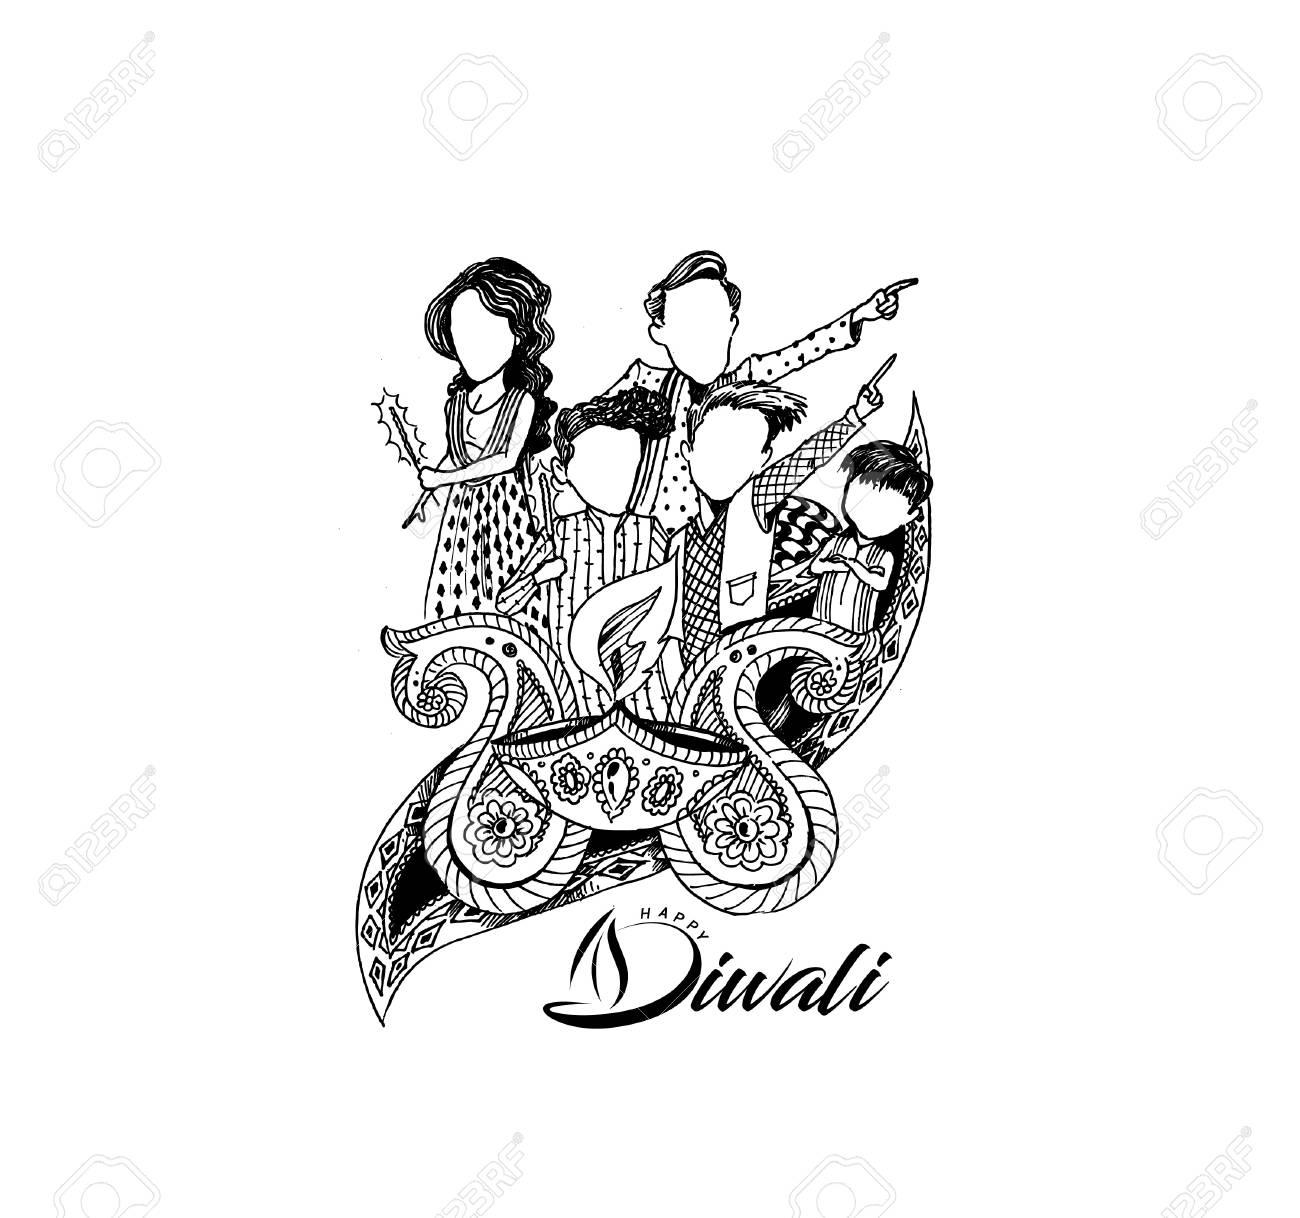 Happy diwali creative flyer for diwali festival vector illustration